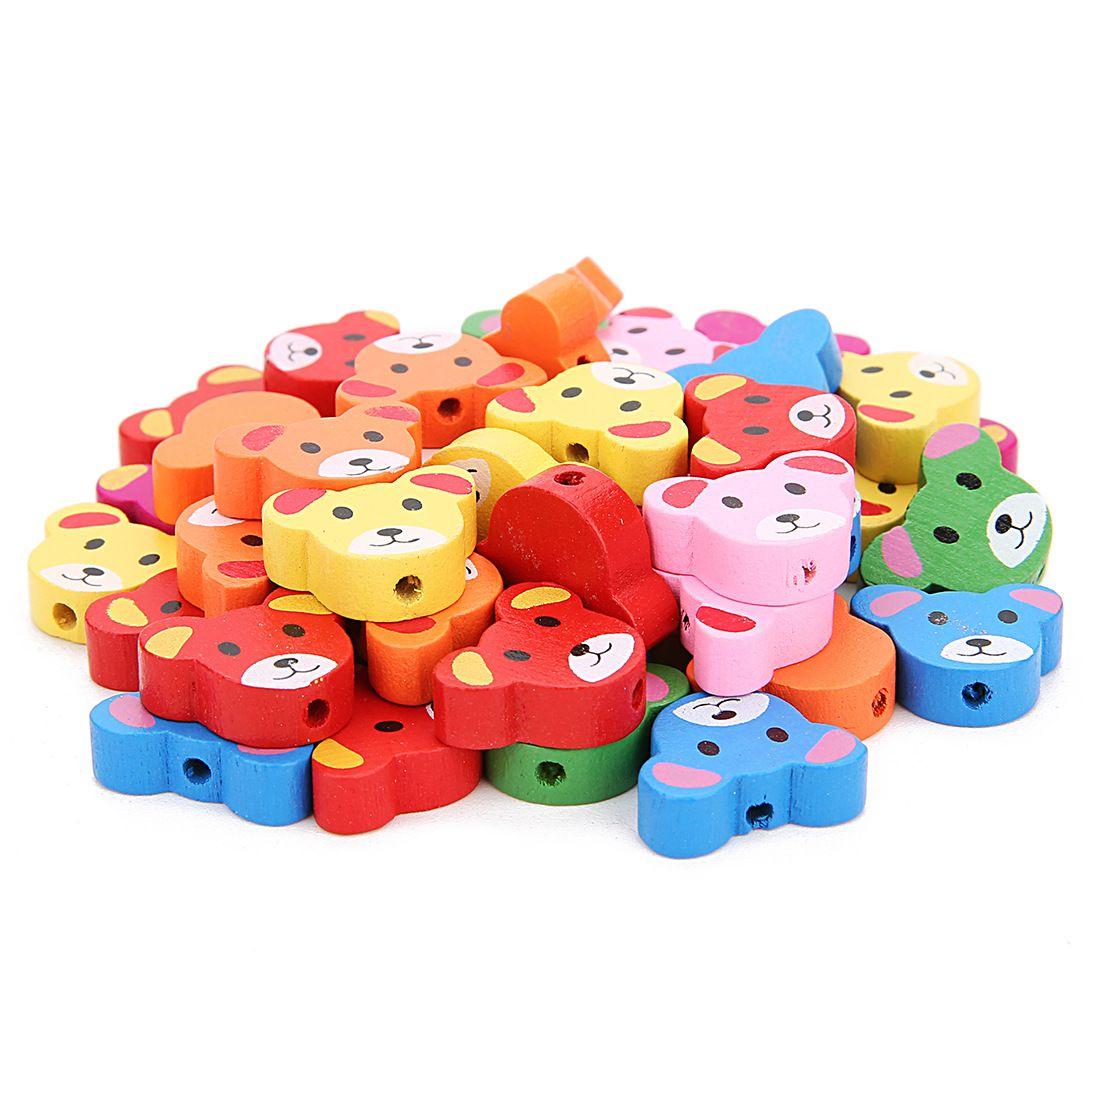 100pcs colorful cartoon Shape Wood Beads Craft/Kids Jewelry Making for bracelet 20MM